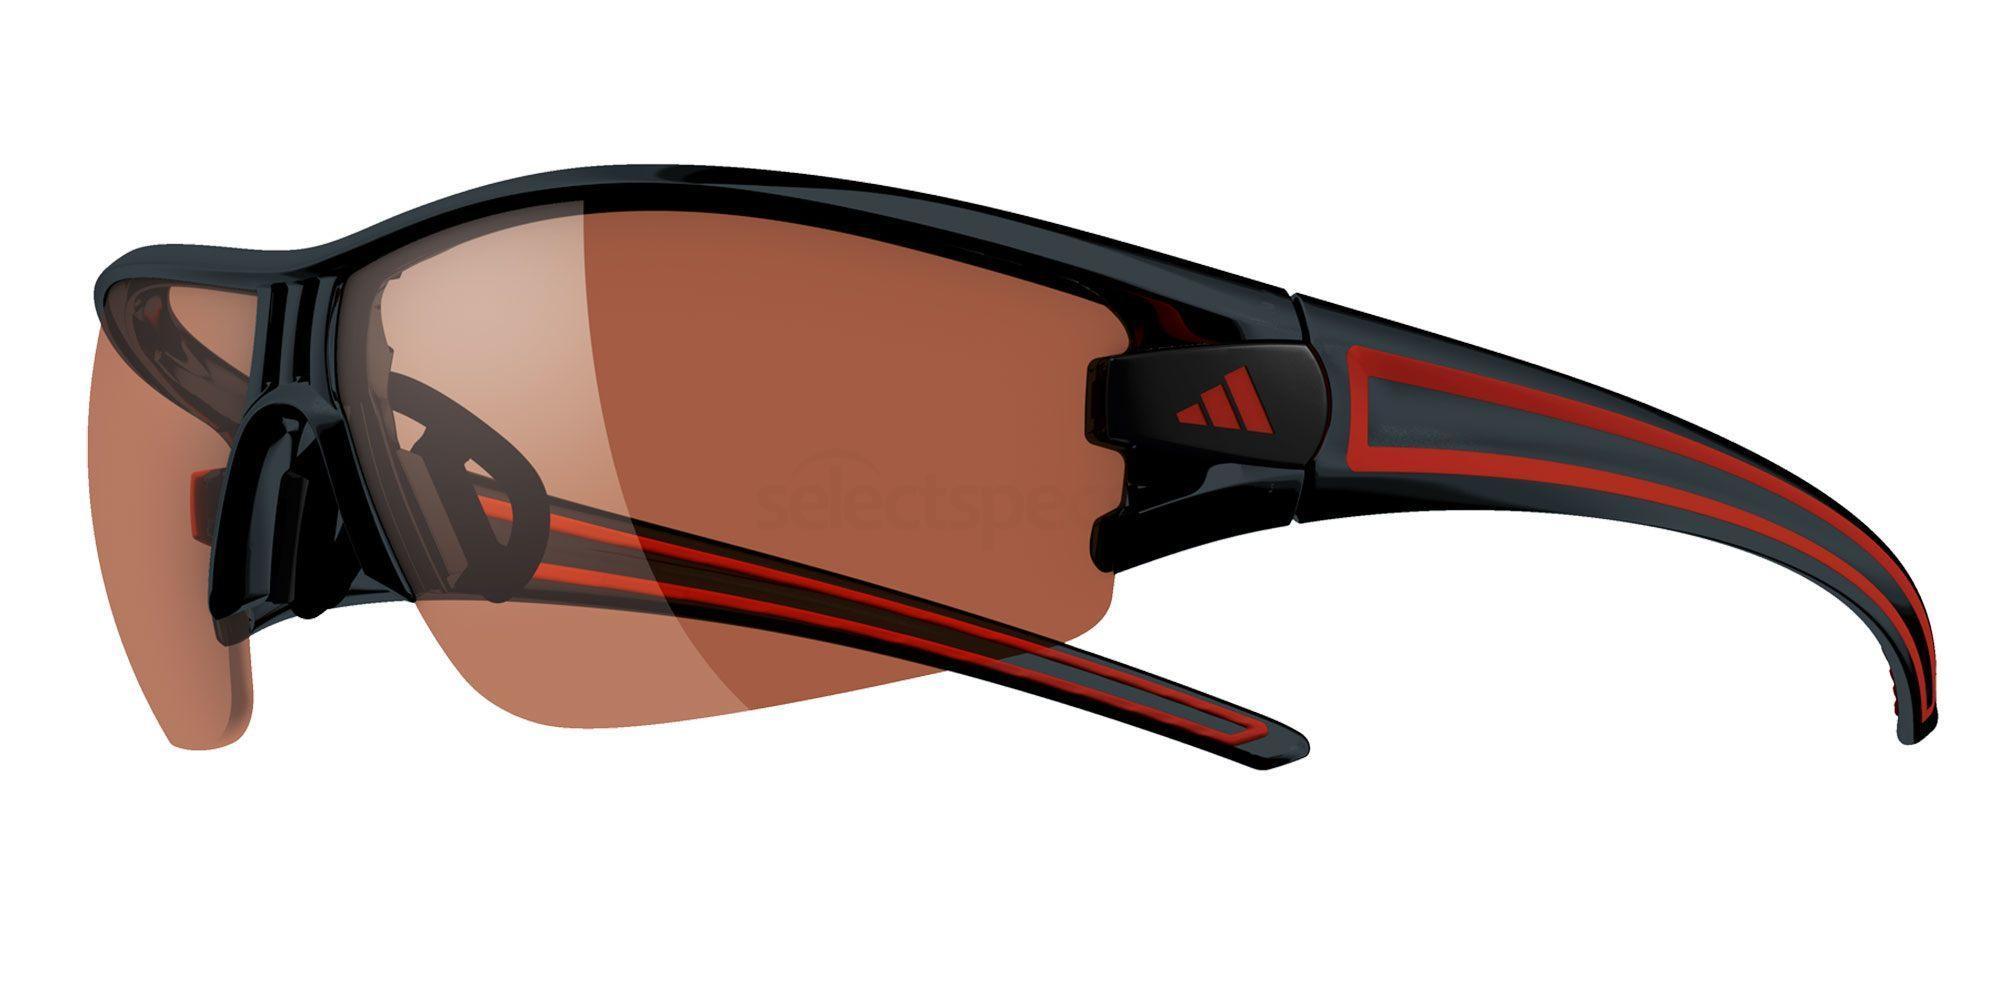 a412/00 6050 a412 Evil Eye Halfrim XS Sunglasses, Adidas